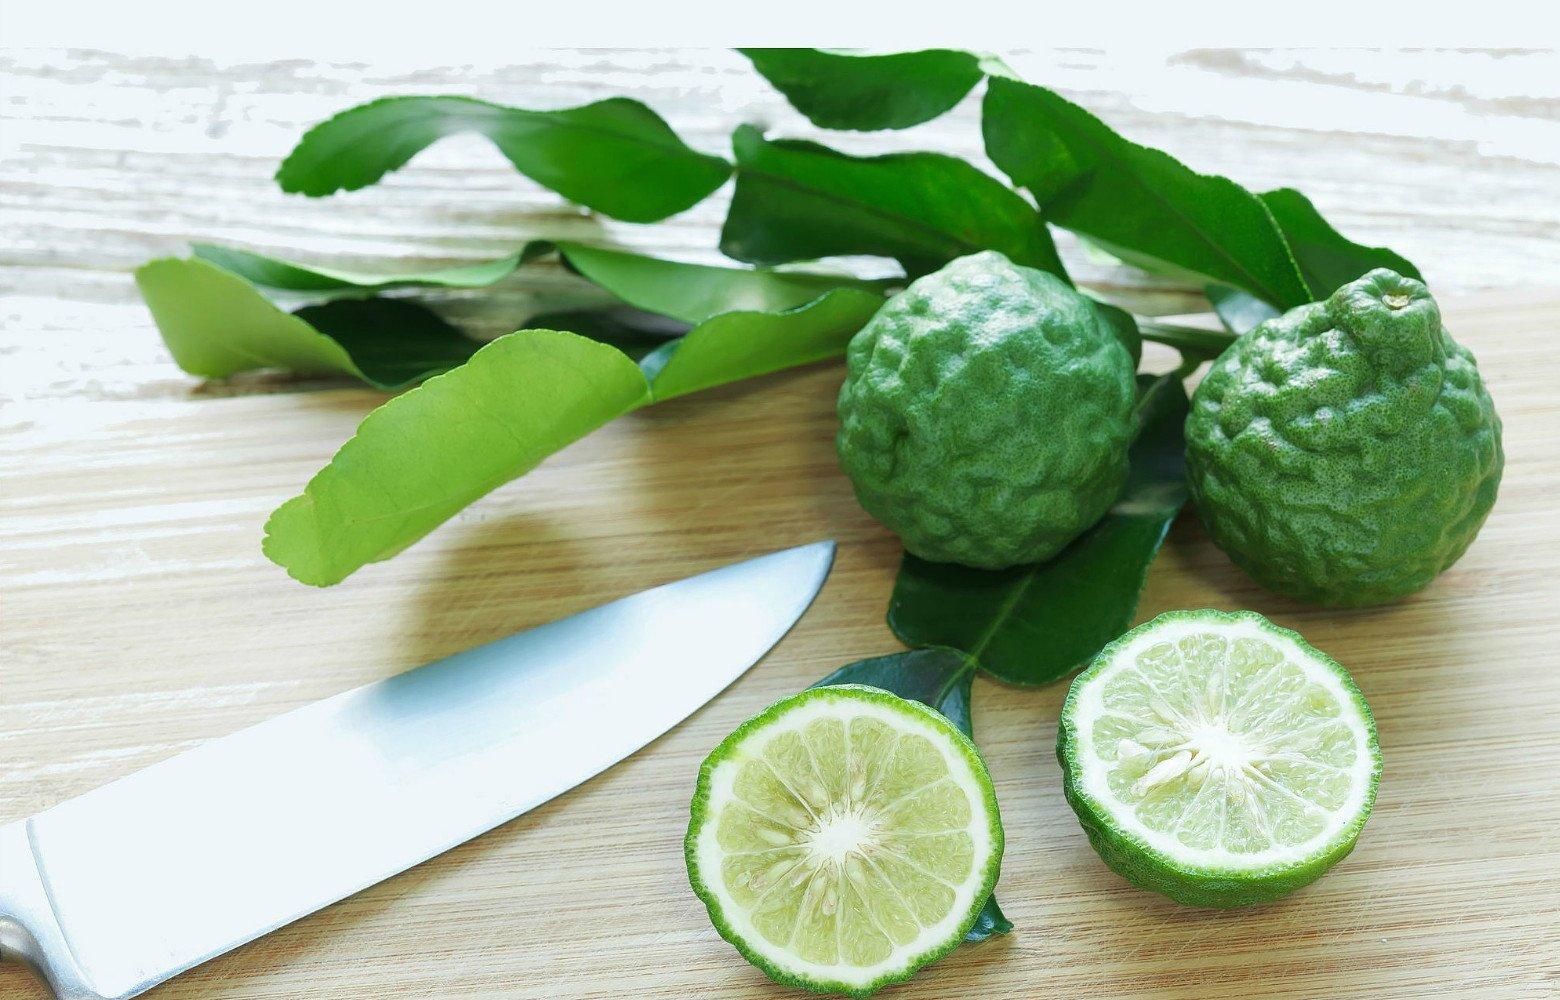 Kaffir Lime Tree-Fruit Bearing Size-Indoors/Out-NO Ship TX,FL,AZ,CA,LA,HI-5'' Pot by Hirt's Gardens (Image #1)